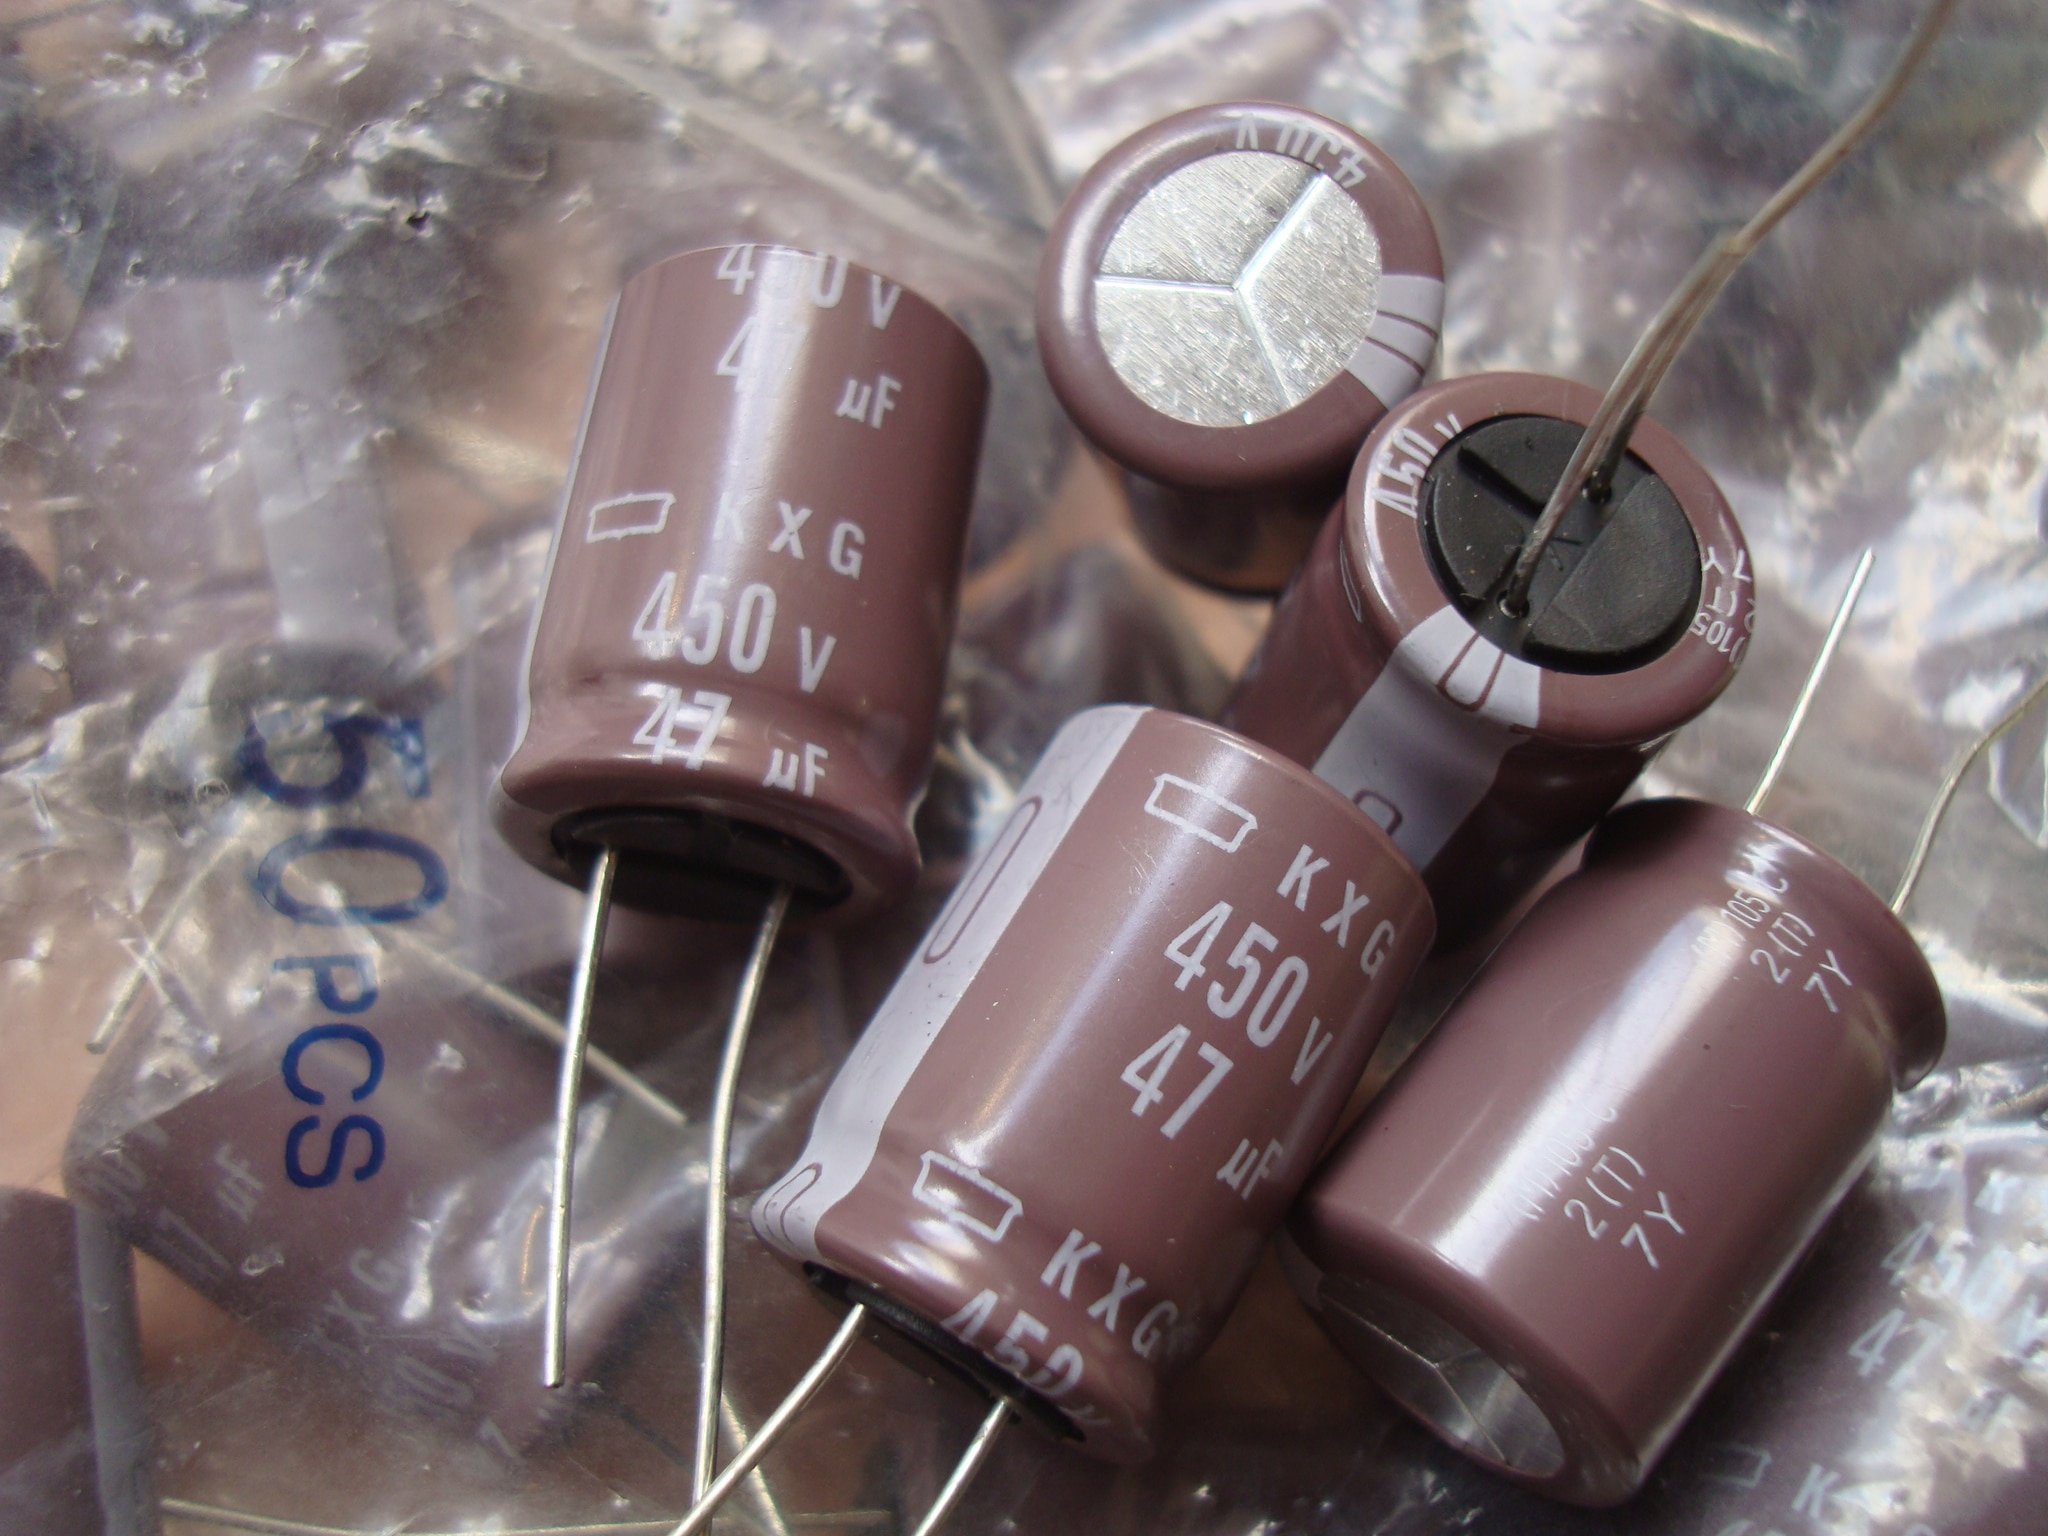 50pcs/lot Original JAPAN NIPPON KXG series 105C high frequency capacitor aluminum electrolytic capacitor free shipping 50pcs lot original japan nippon kze series 105c high frequency capacitor aluminum electrolytic capacitor free shipping